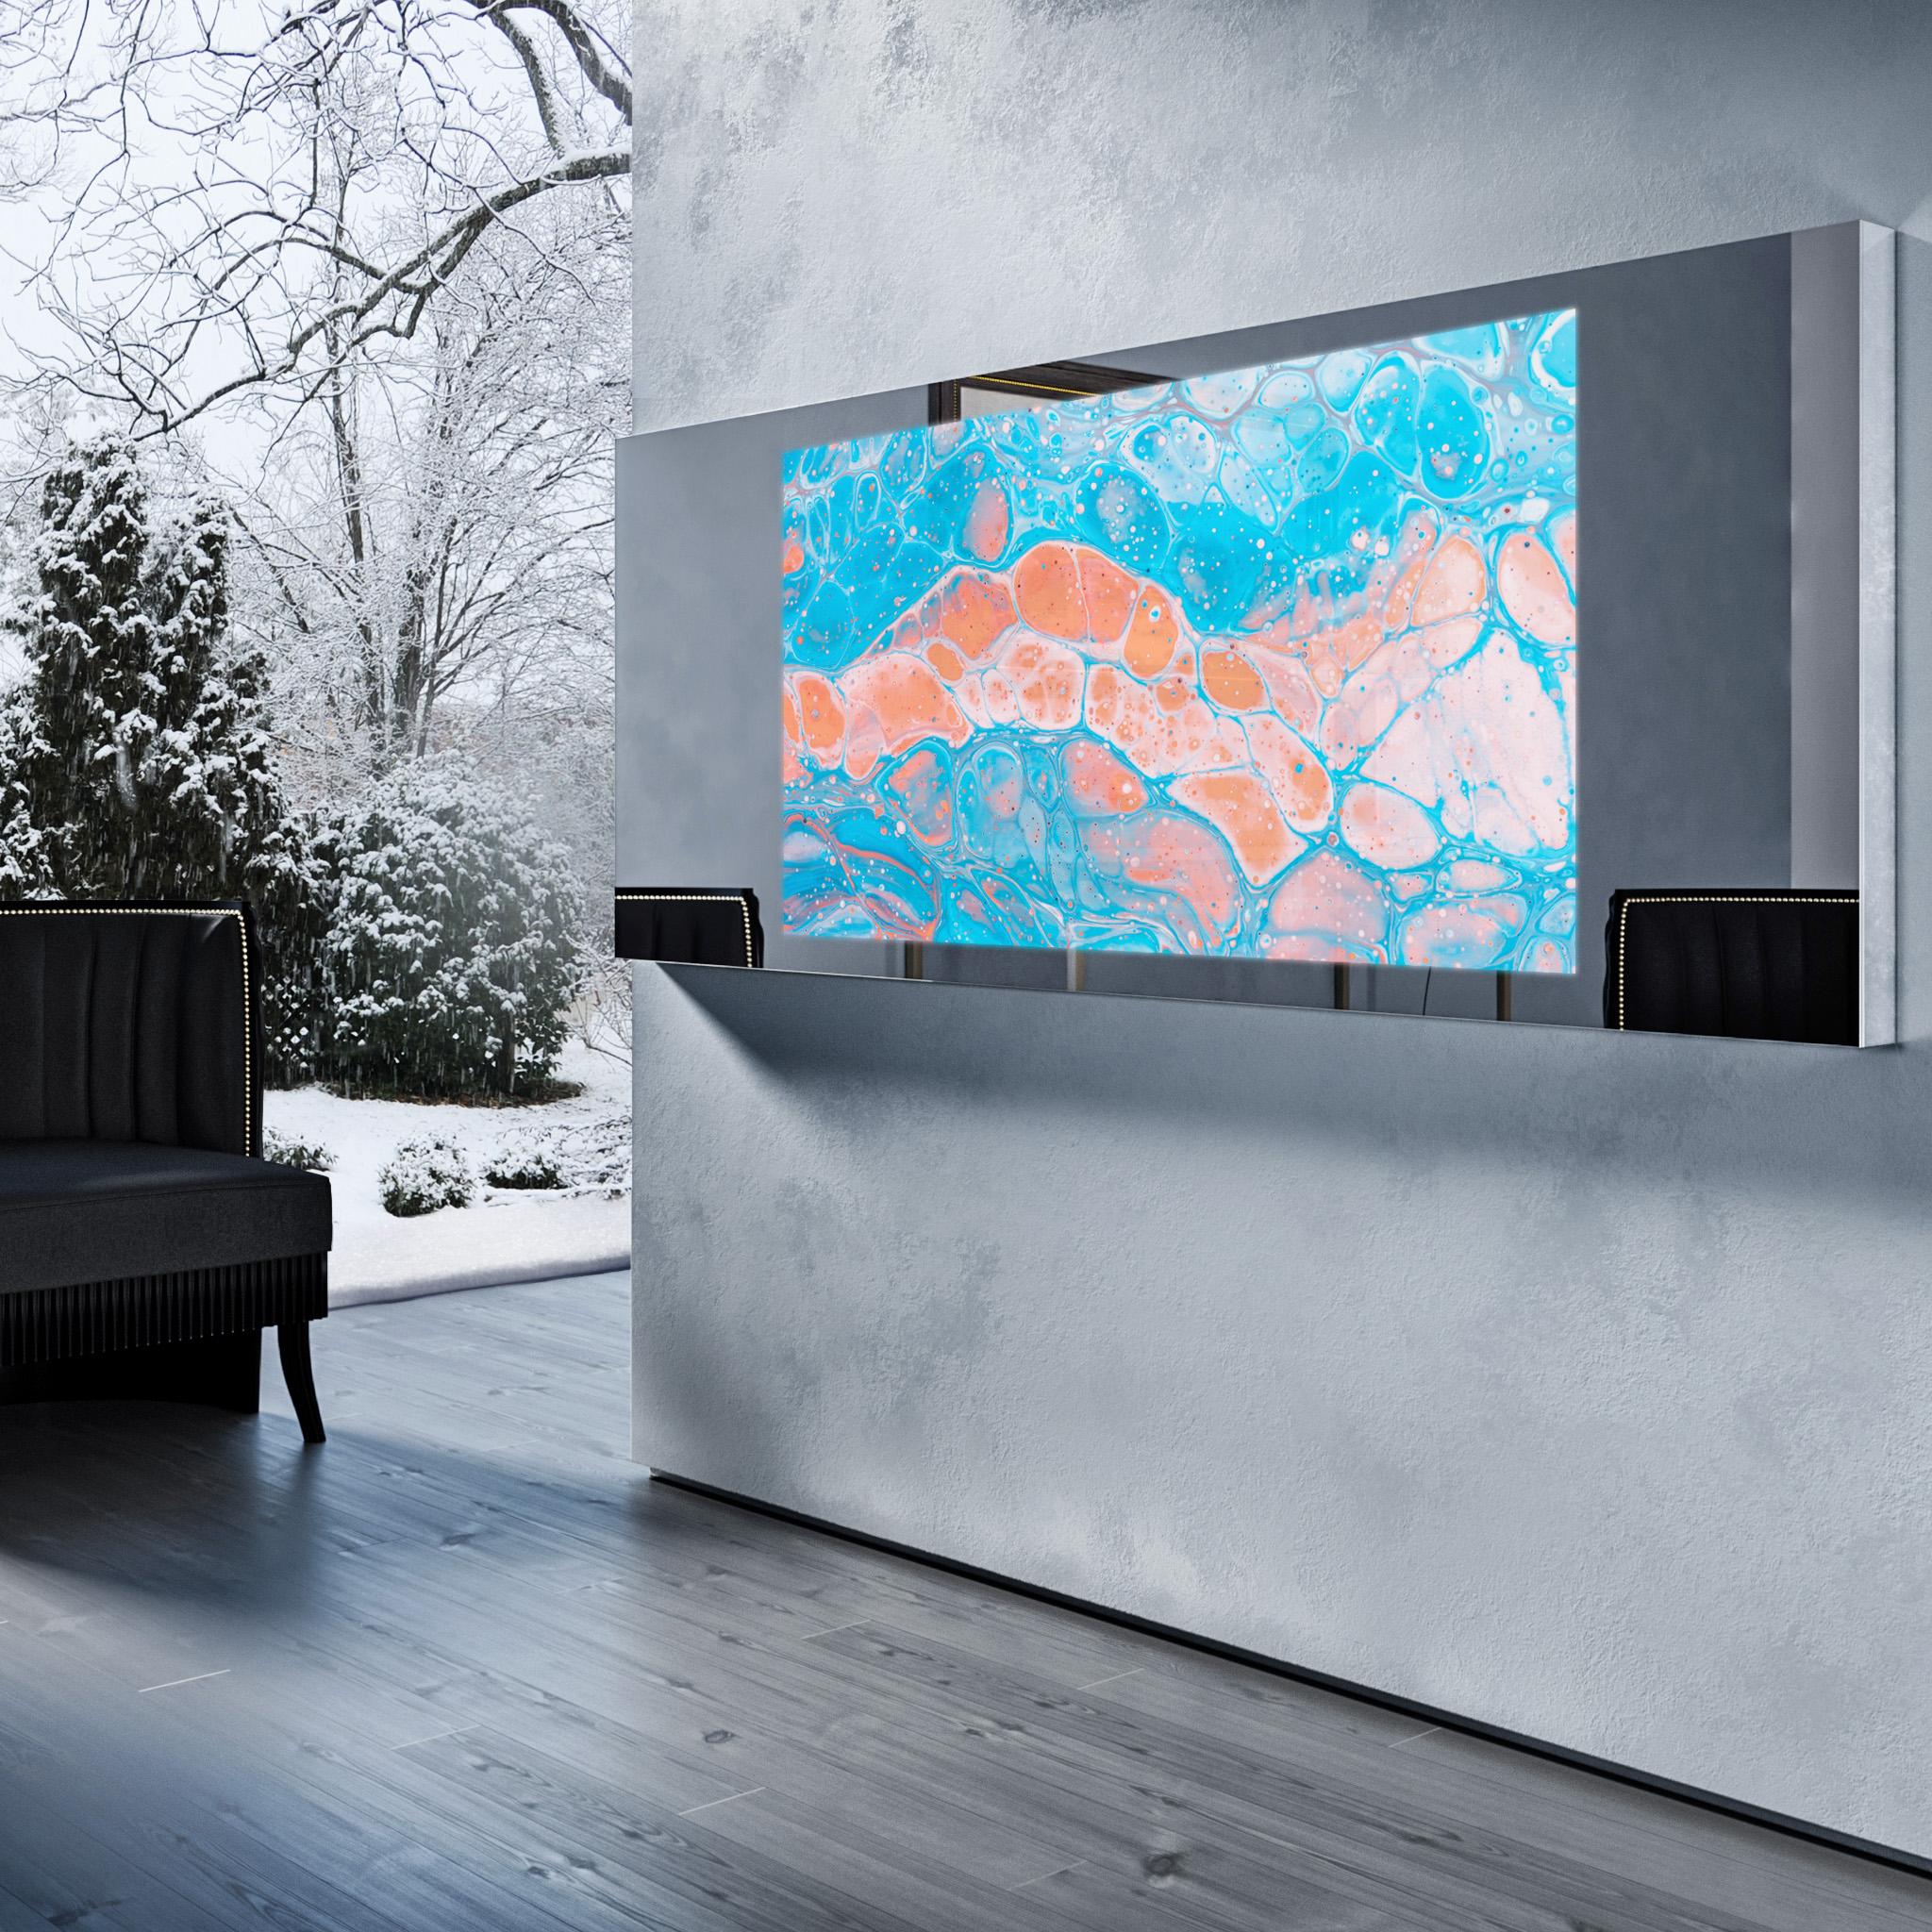 Зеркальный телевизор Tele-Art Q70W Line Mirror Titan Mirror